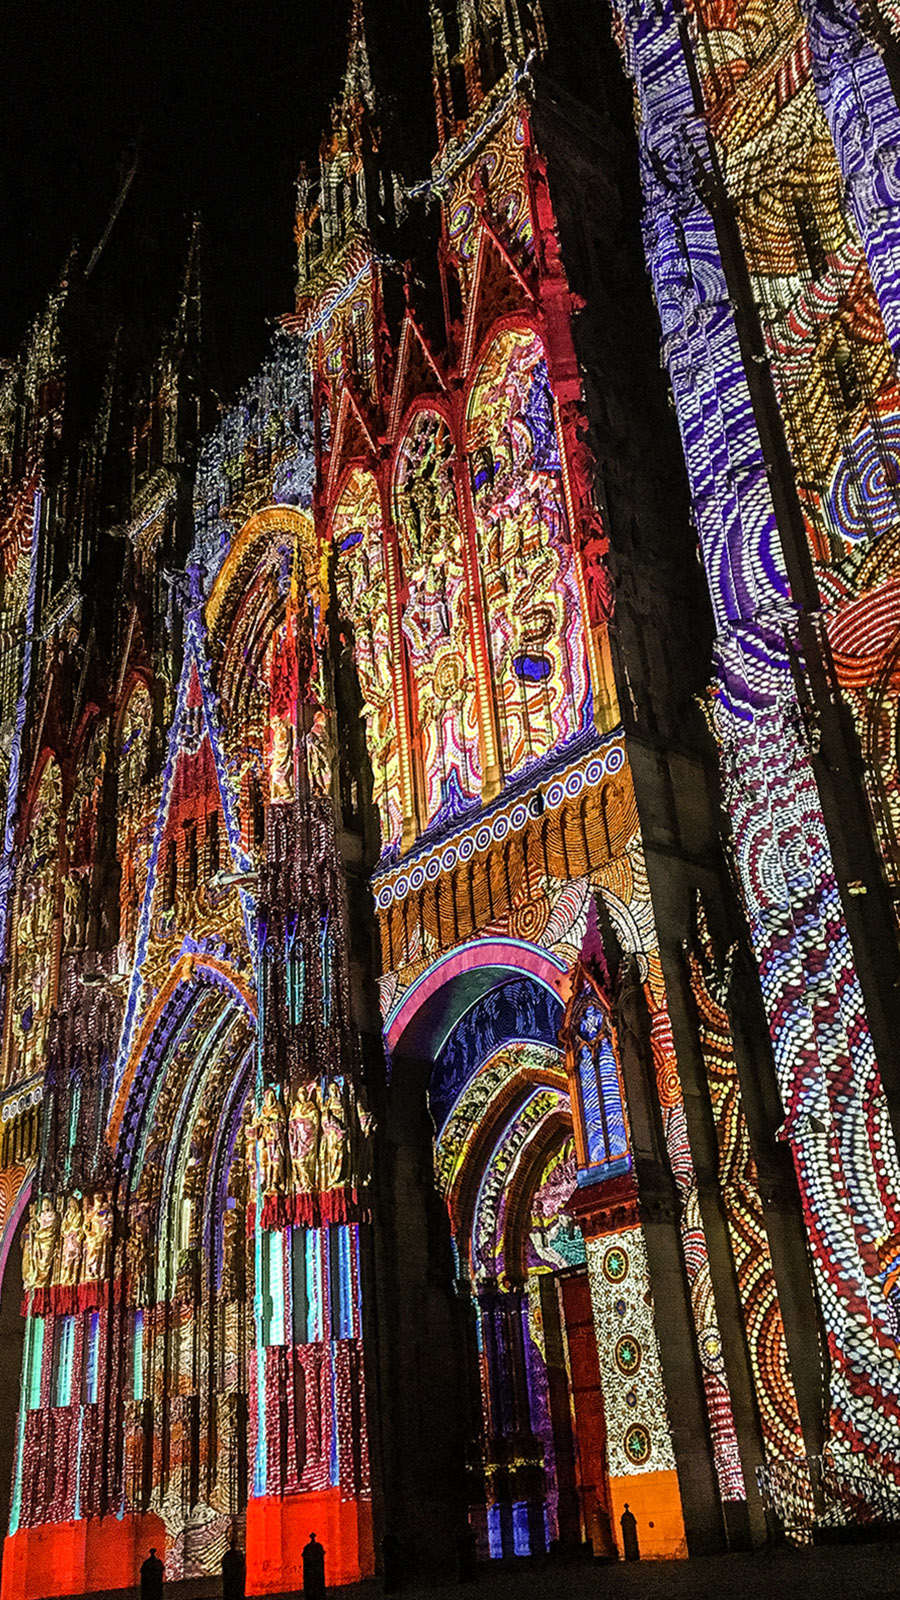 Rouen, Videomapping auf der Kathedrale. Foto: Hilke Maunder